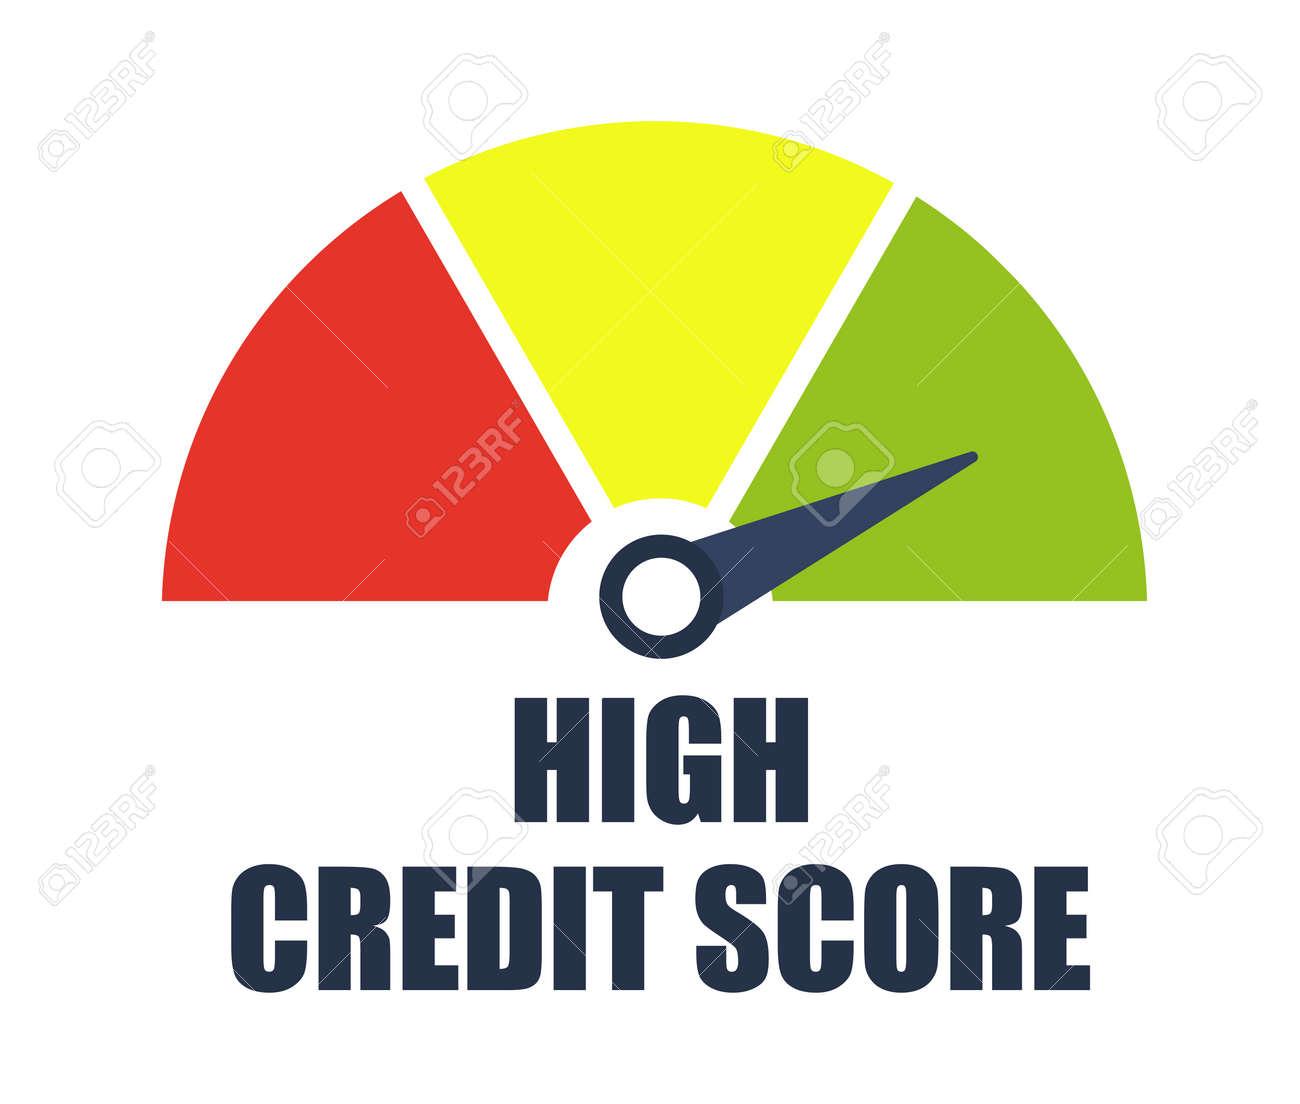 High credit score. Vector illustration. - 128503475